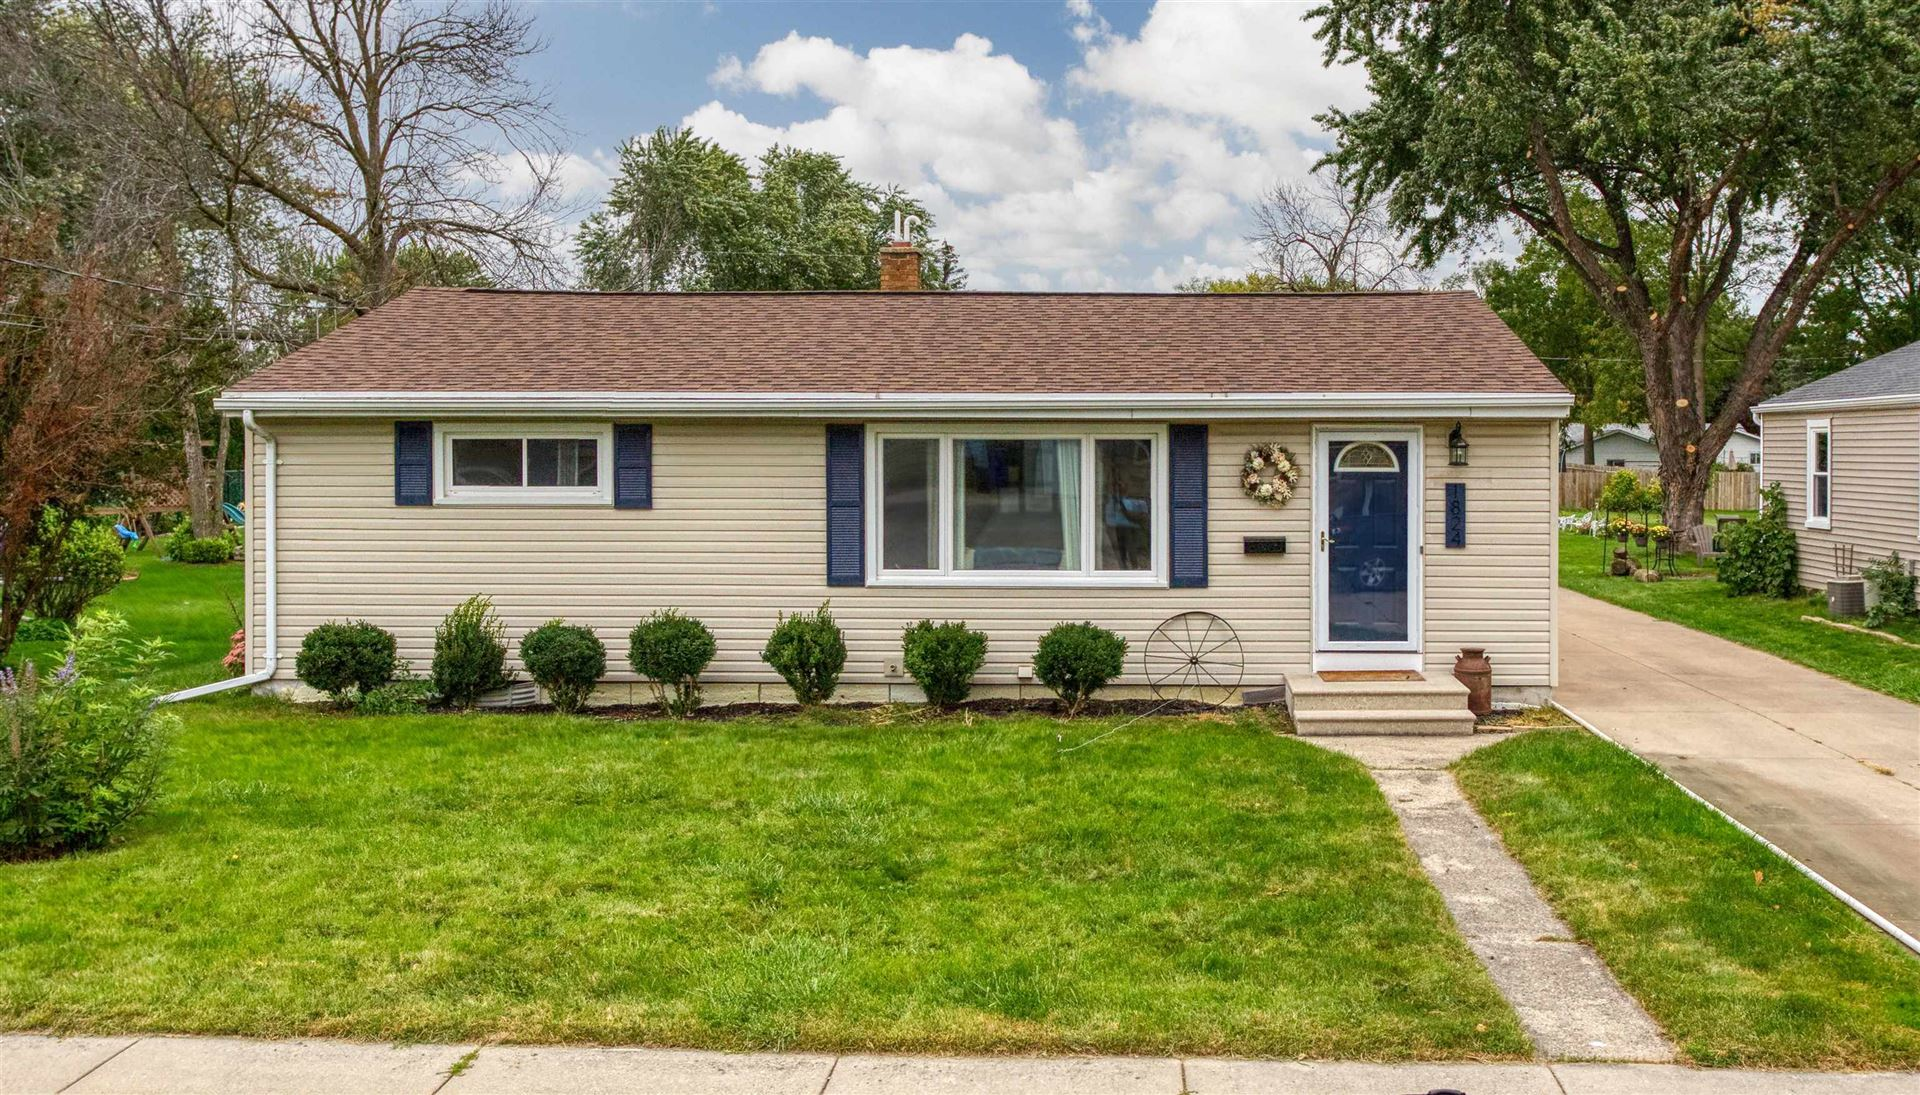 1824 E PAULINE Street, Appleton, WI 54911 - MLS#: 50248408